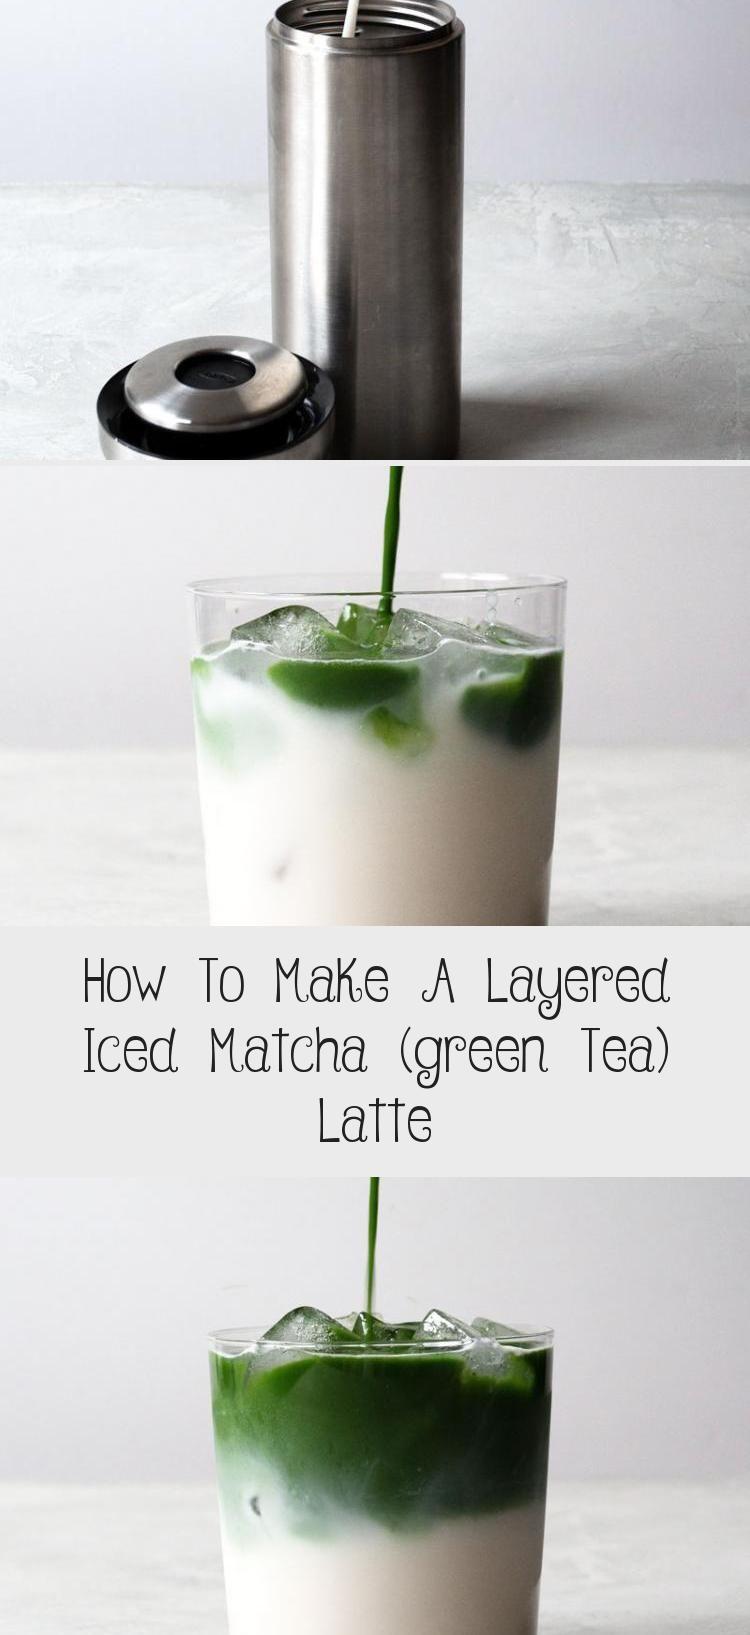 How To Make A Layered Iced Matcha (green Tea) Latte